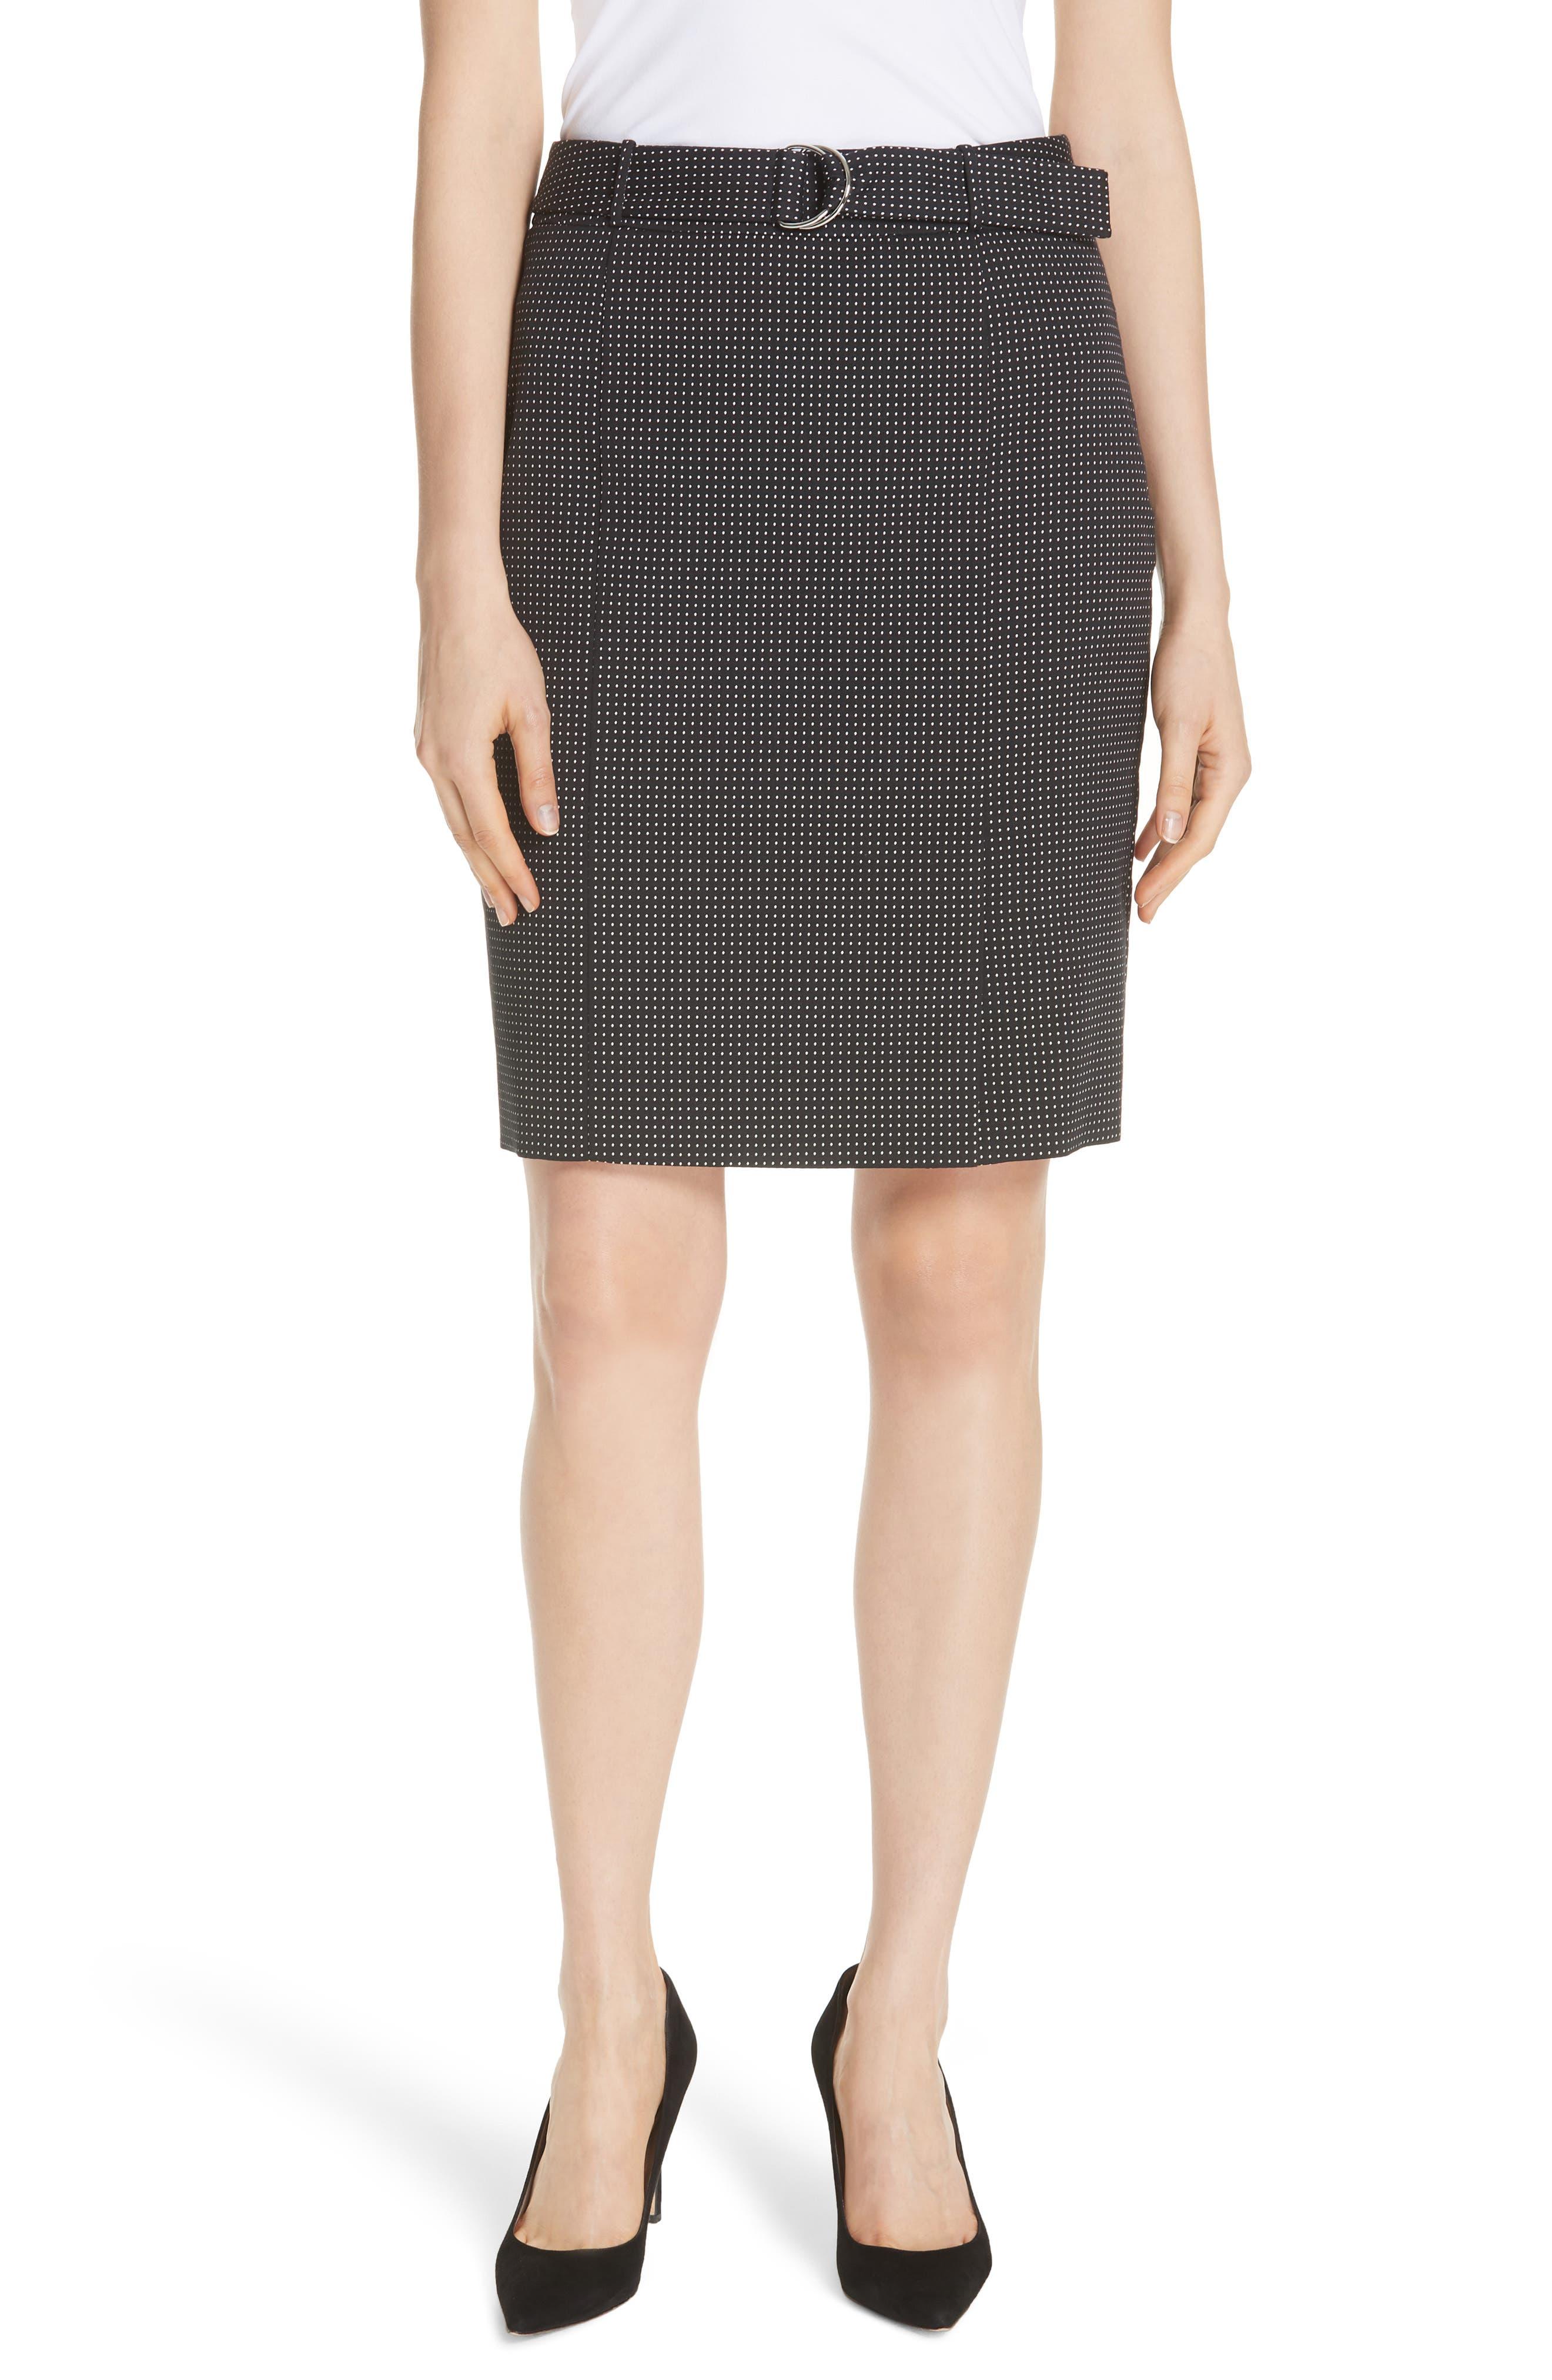 Vumano Dot Dessin Stretch Suit Skirt,                             Main thumbnail 1, color,                             BLACK FANTASY